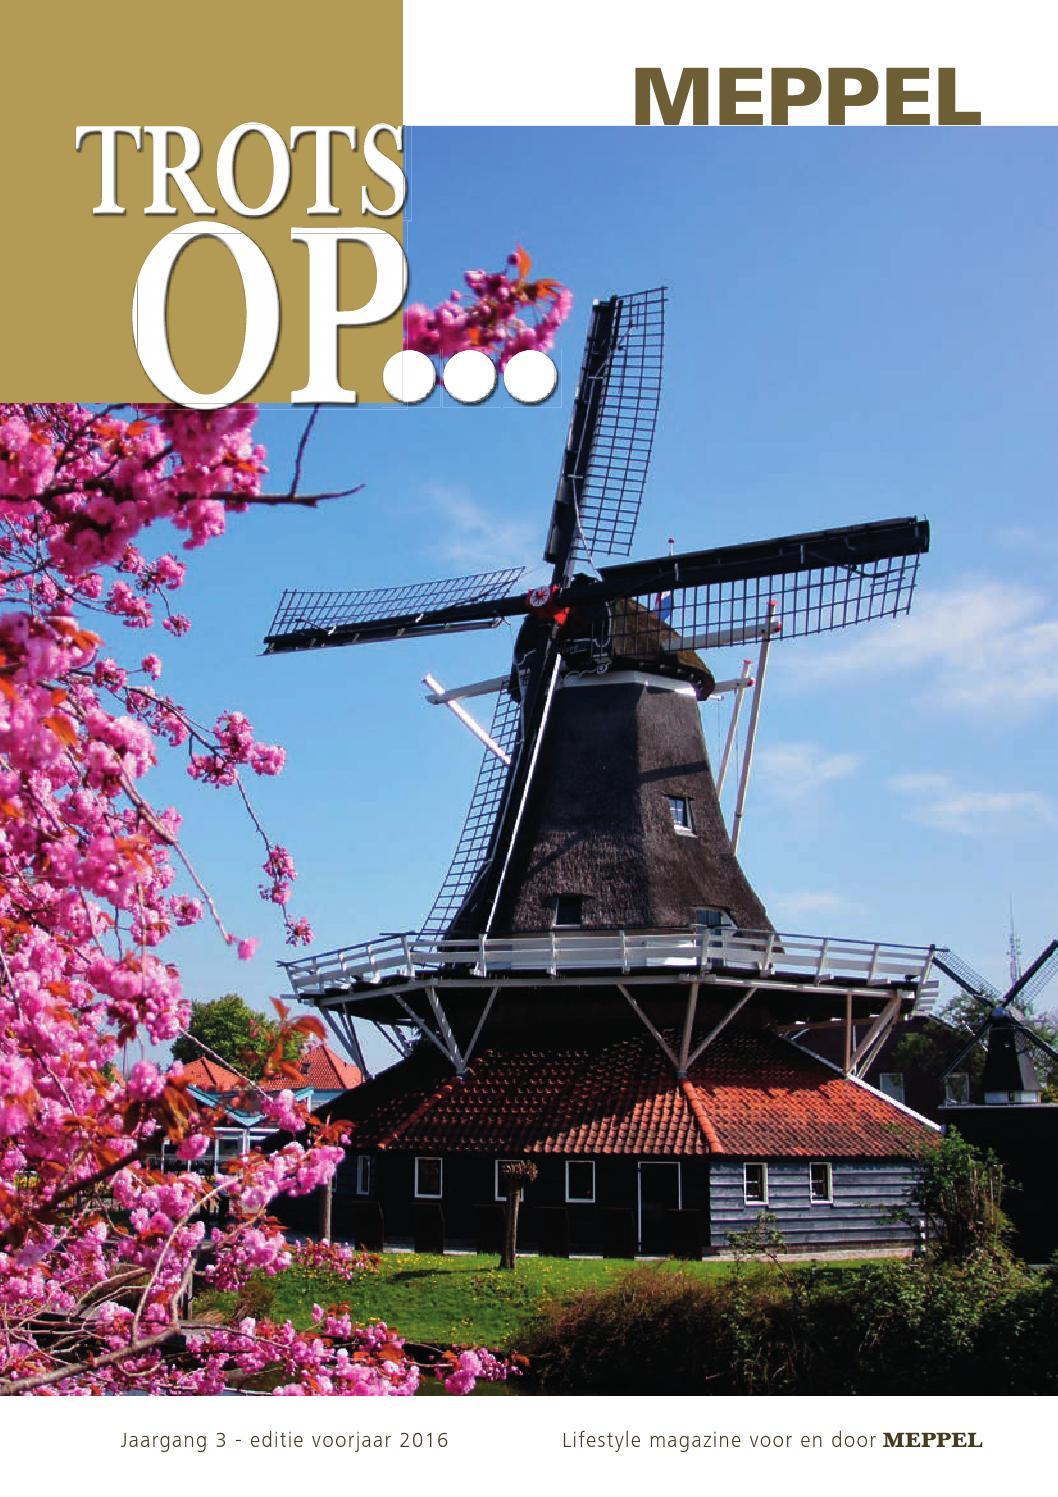 Vbc magazine 2015 juli   december by vlaemynck busines center   issuu